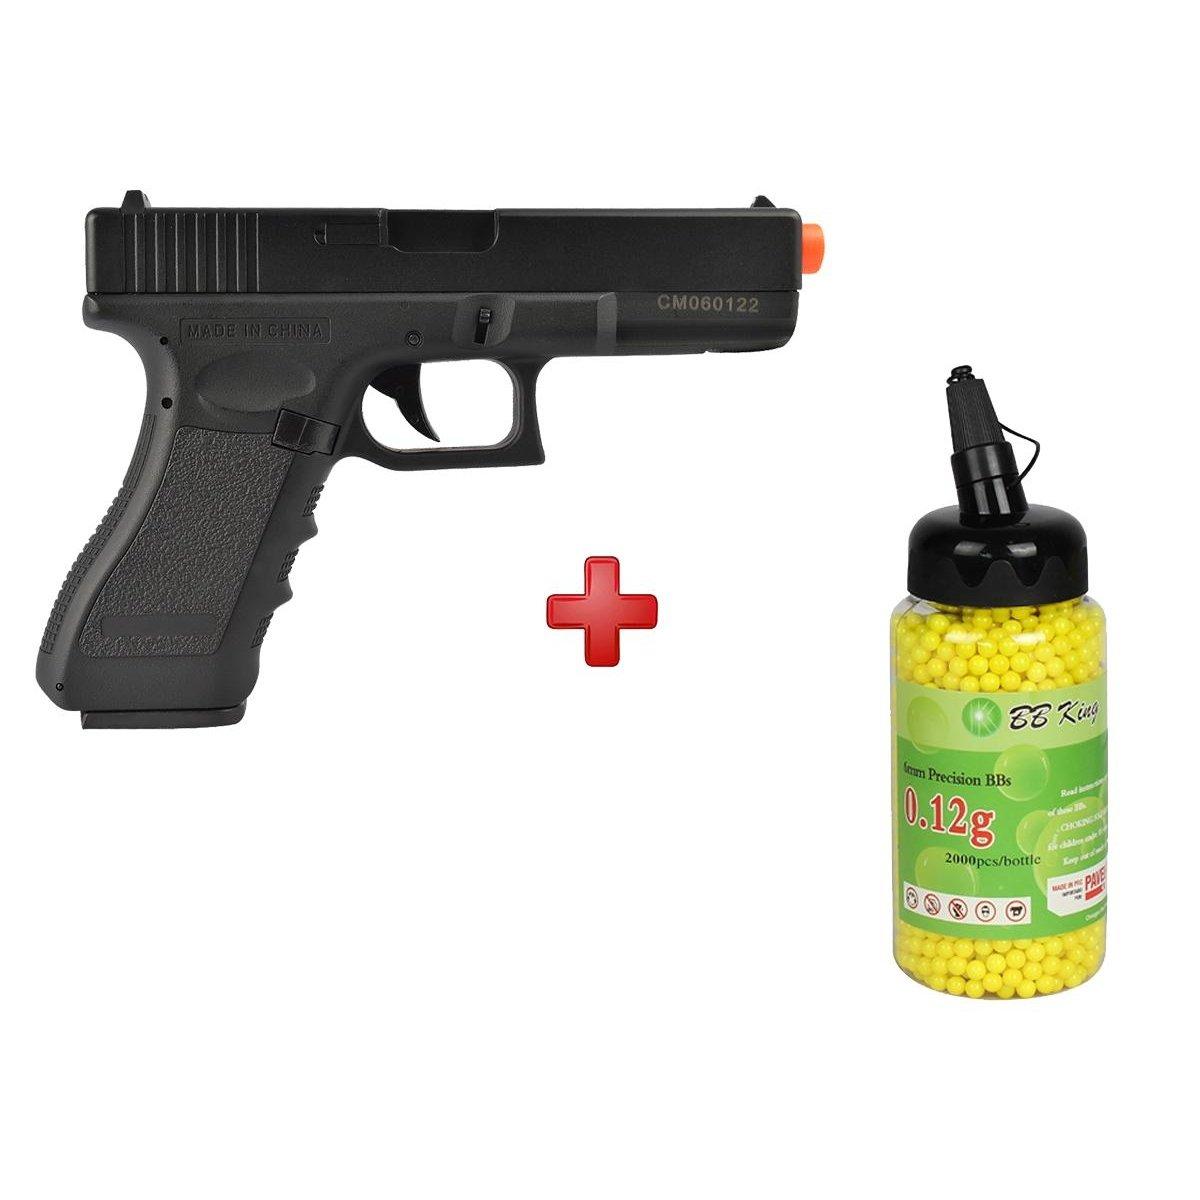 Pistola Airsoft Elétrica Cyma Glock G18C CM030 Semi-Metal Bivolt + BBs BB  King 0 12g - Preto